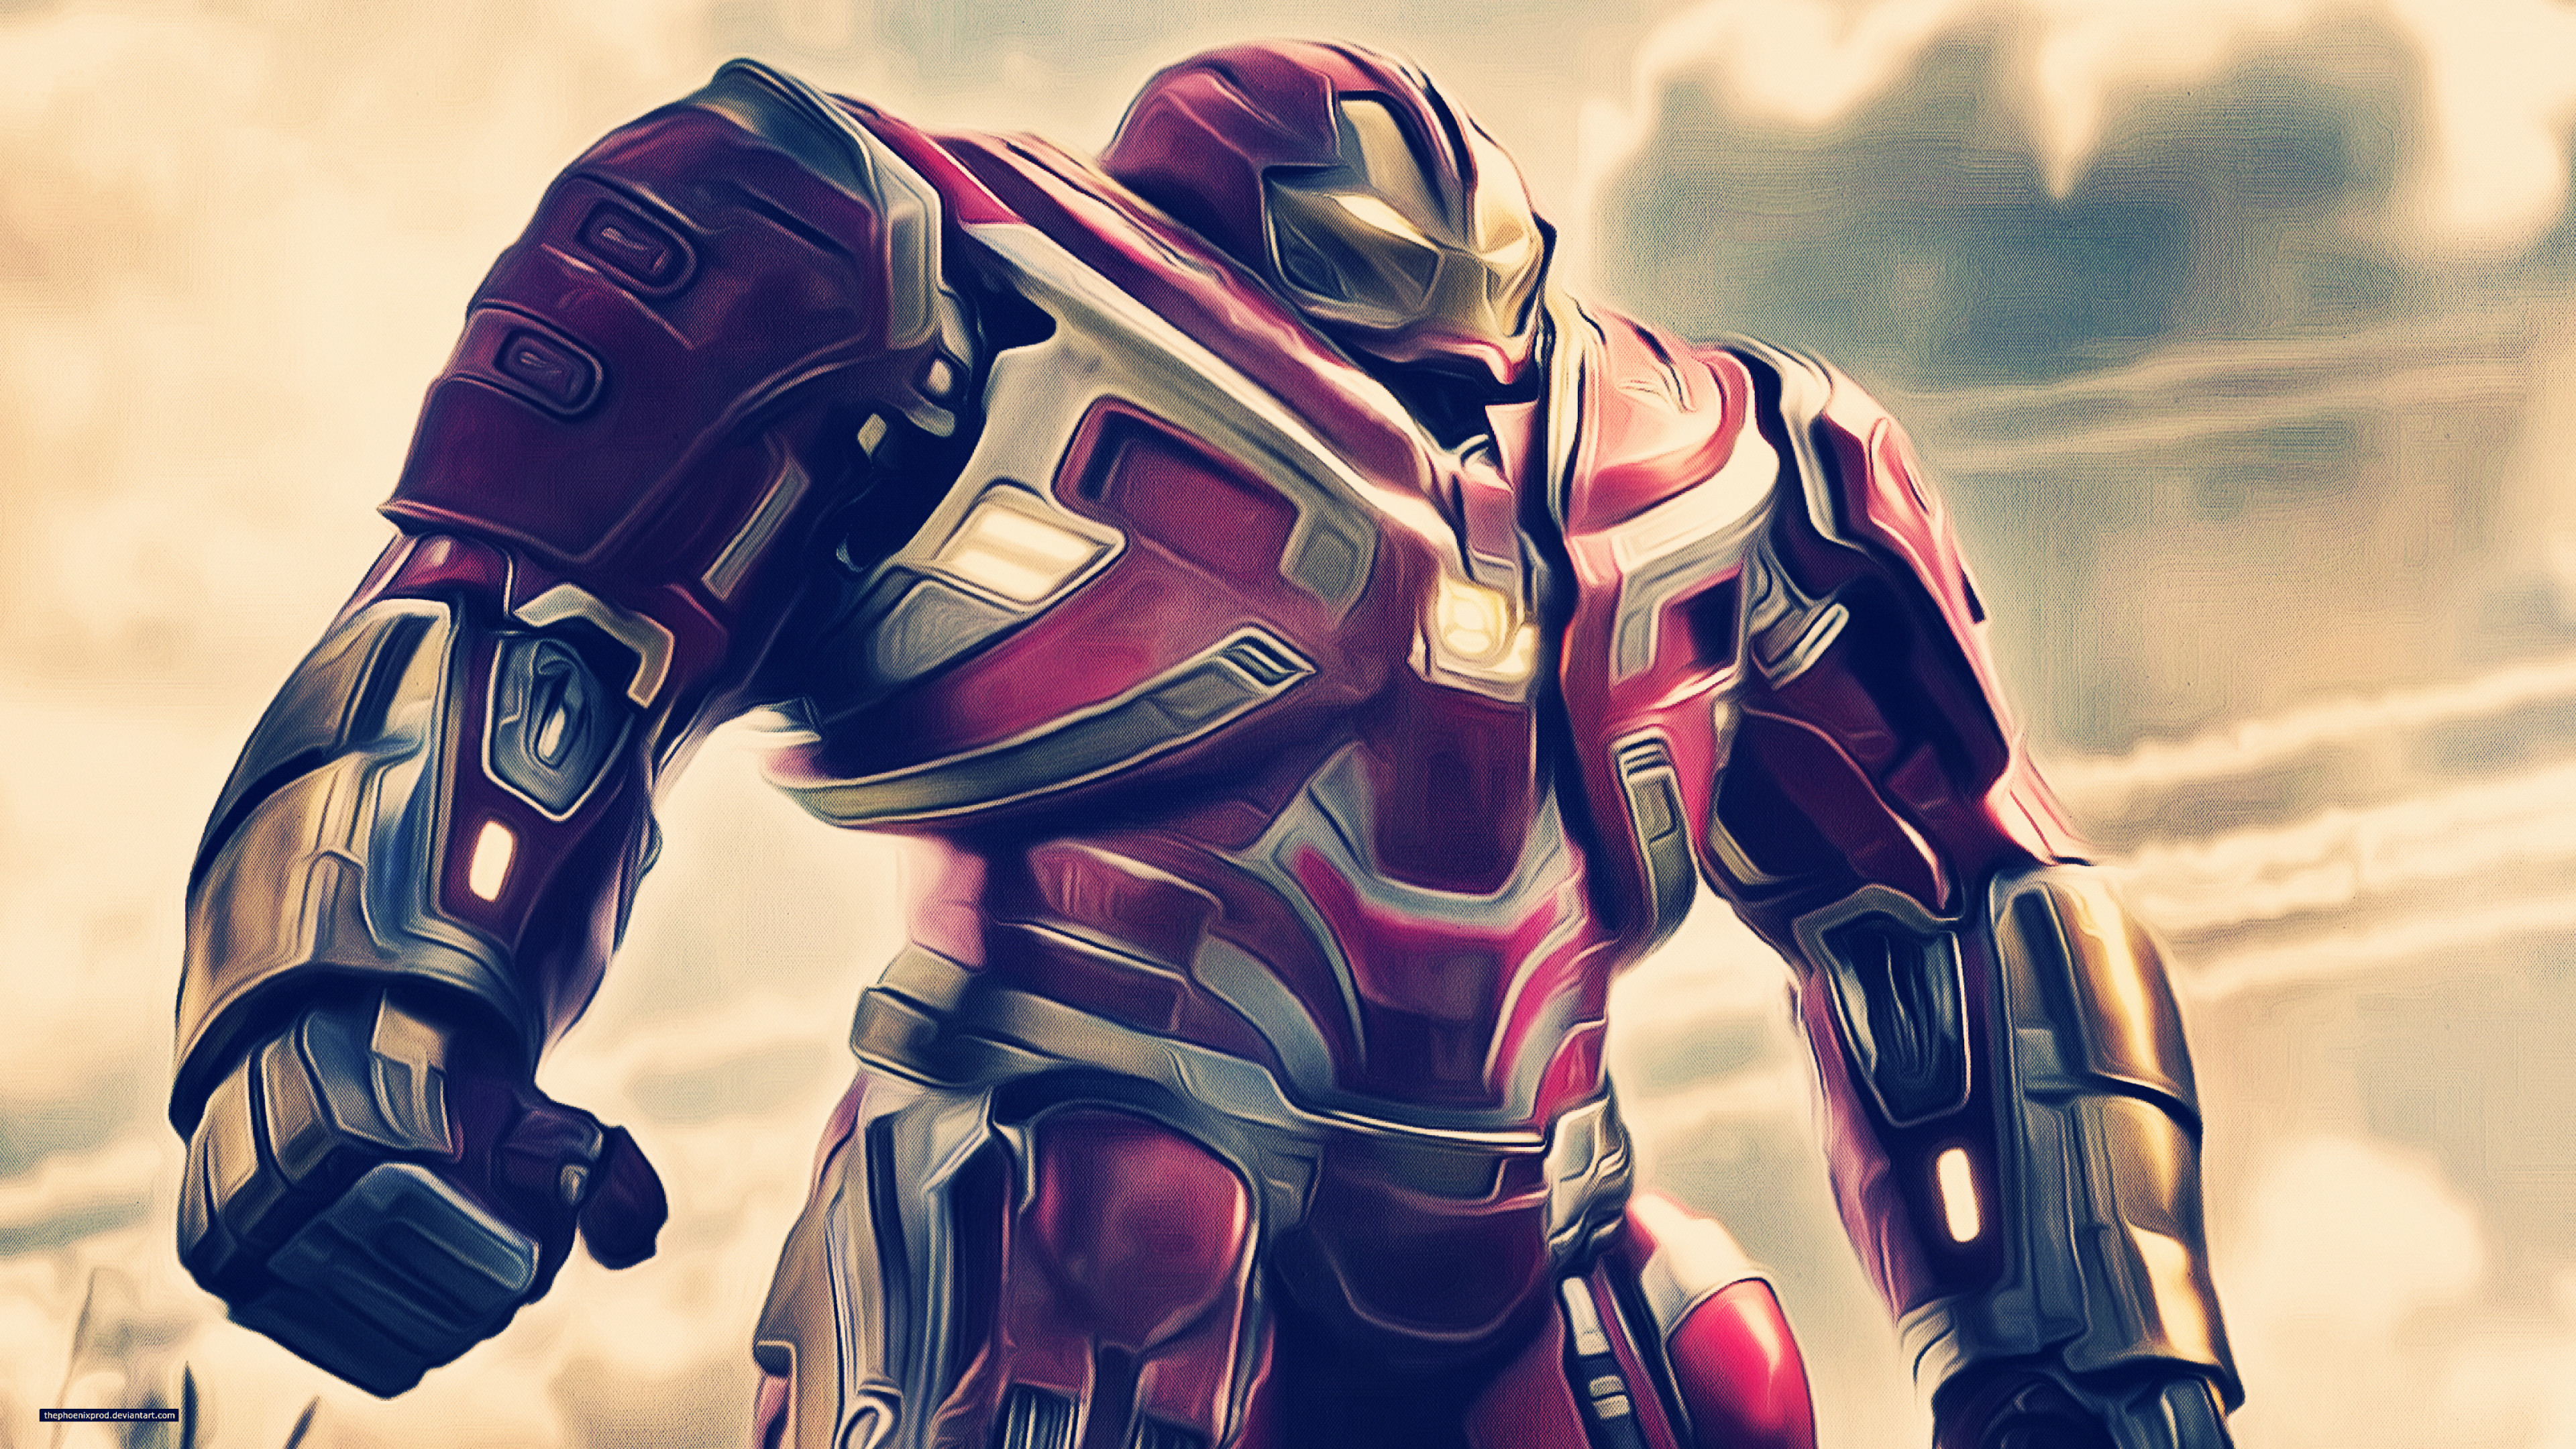 [23+] 4K Marvel Characters Wallpapers on WallpaperSafari